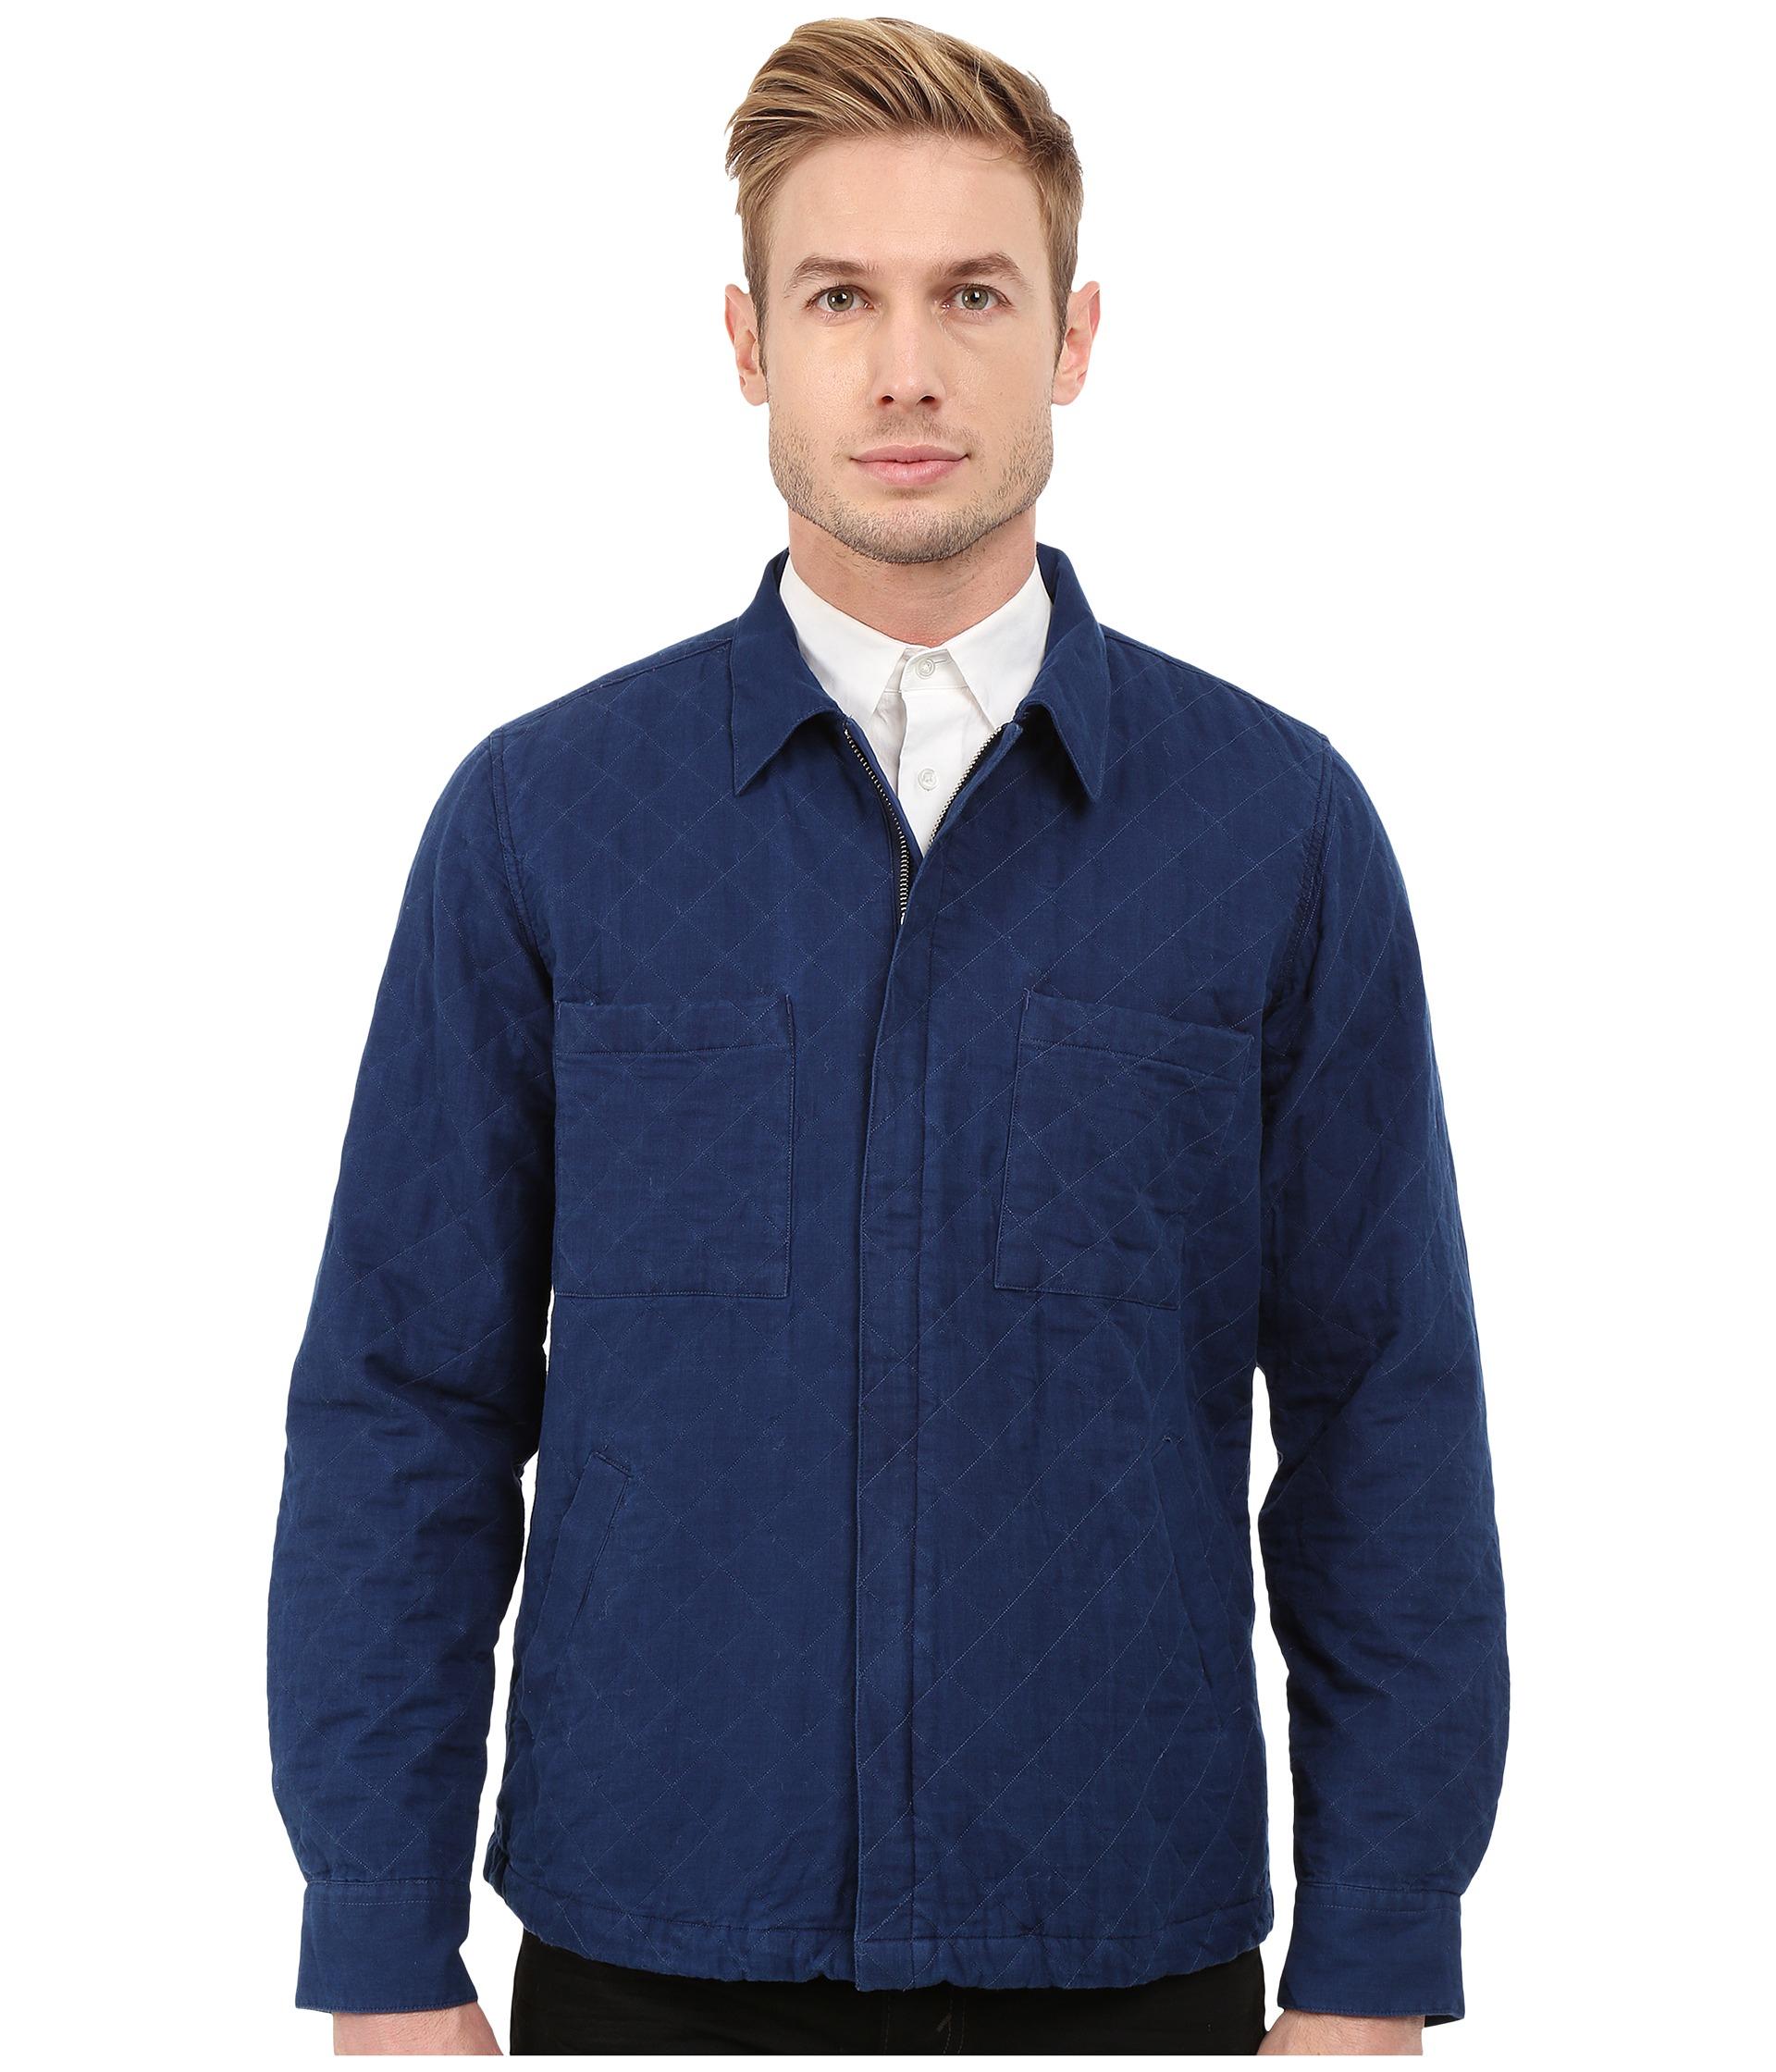 Gant rugger R. Indigo Twill Shirt Jacket in Blue for Men | Lyst